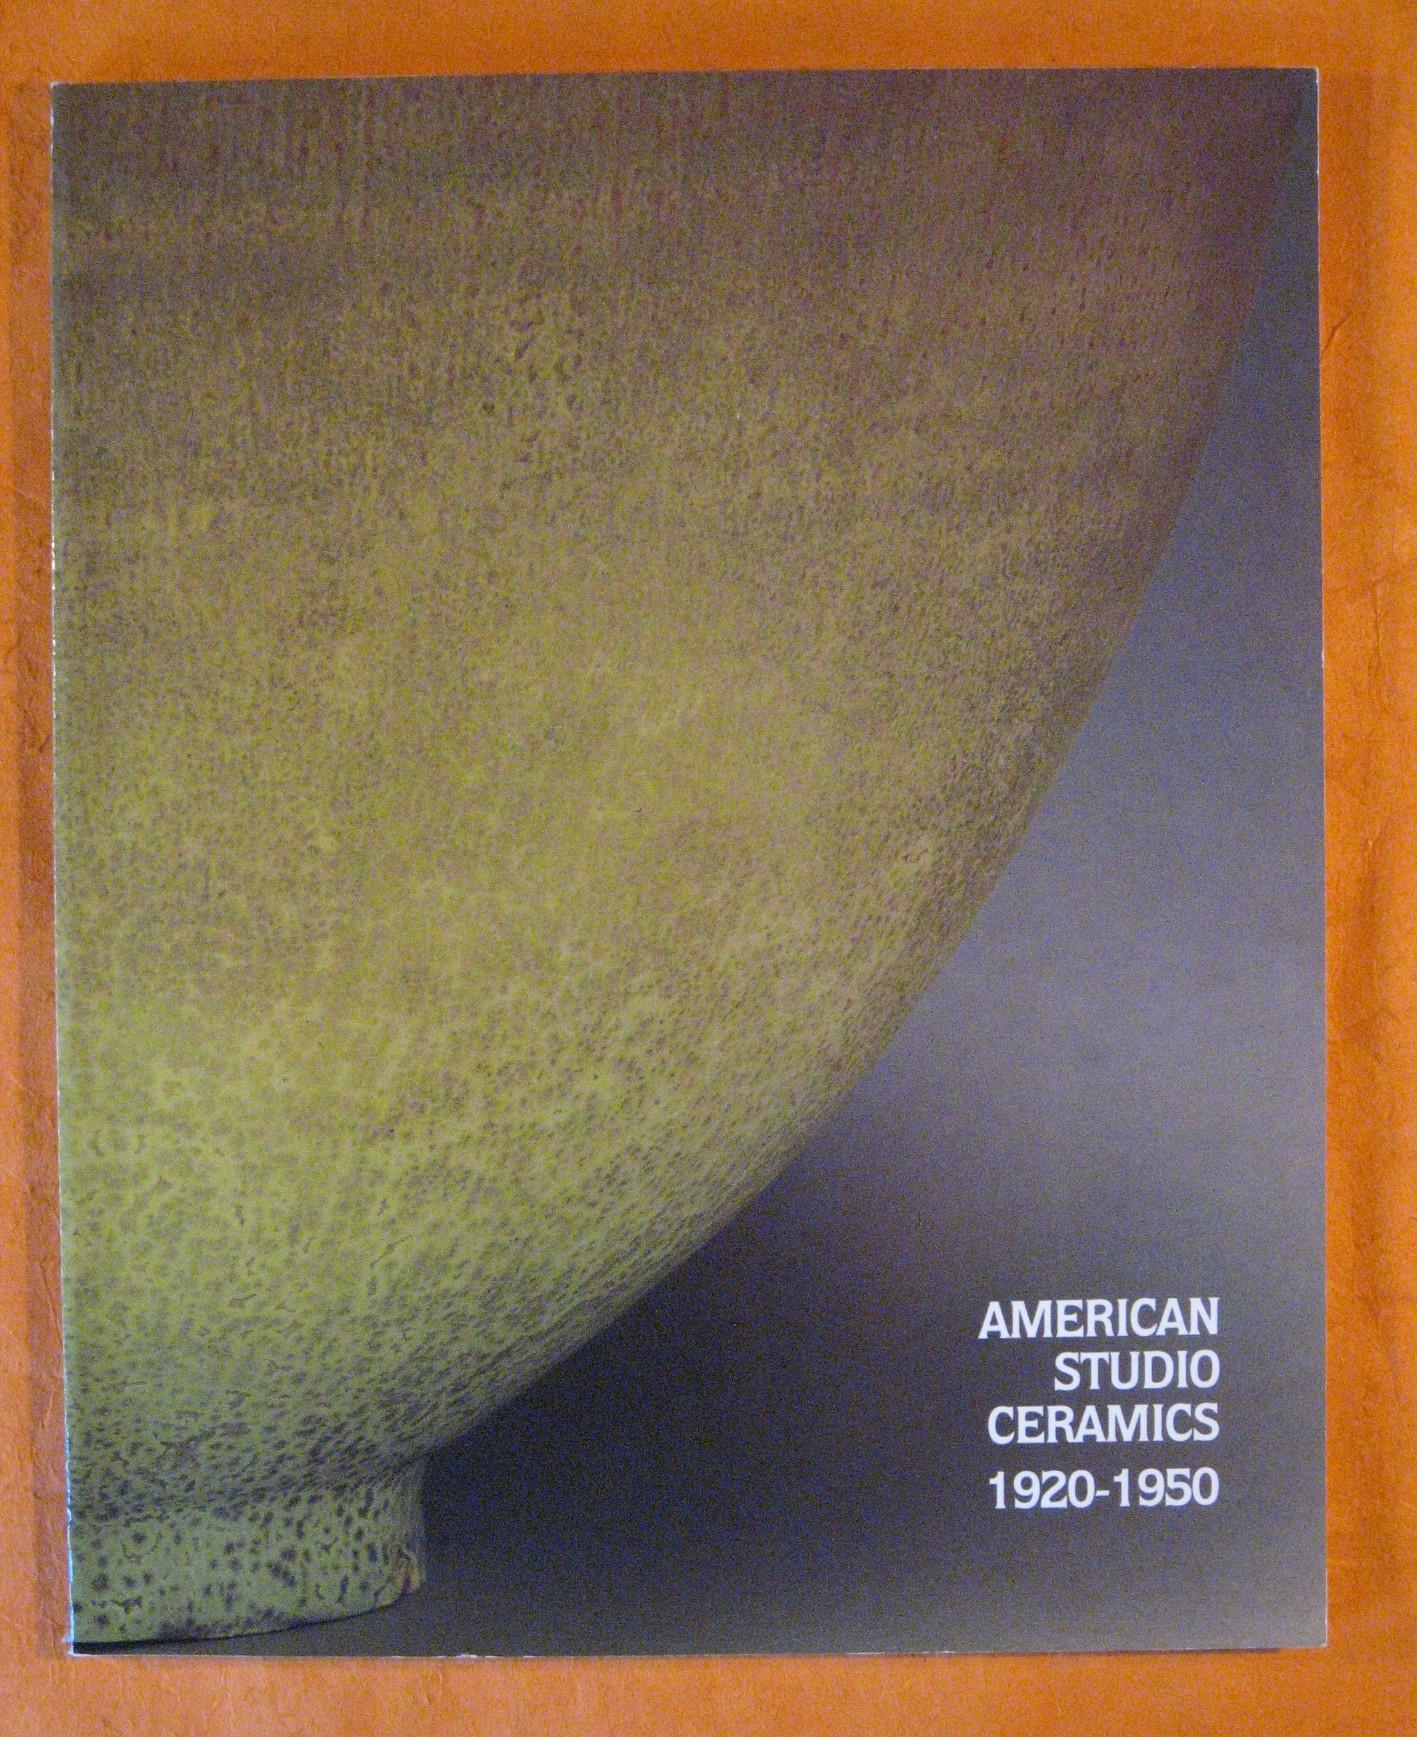 American Studio Ceramics 1920-1950, King, Lyndel